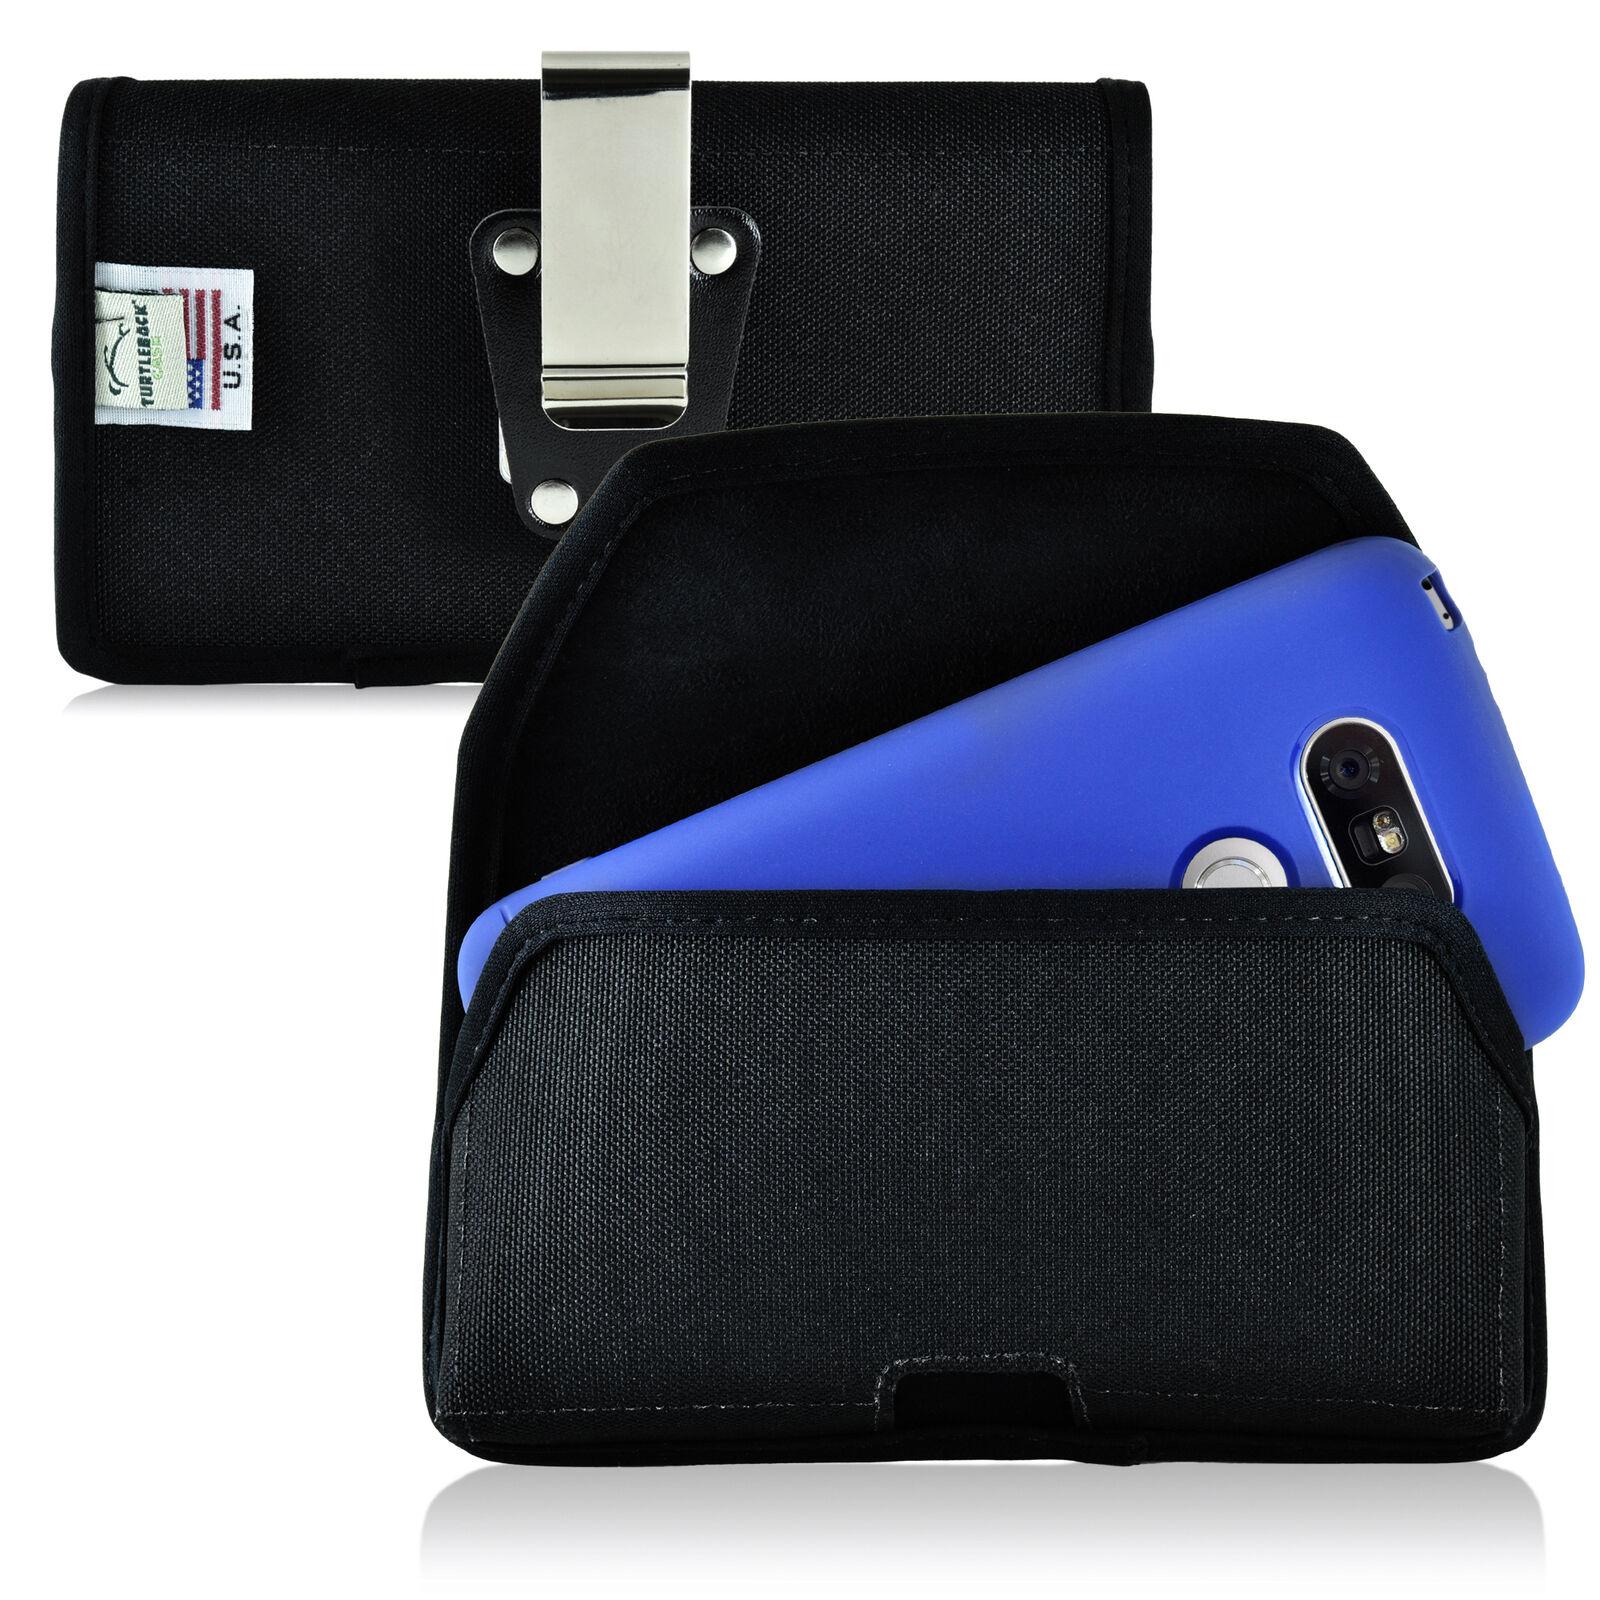 turtleback-lg-g5-nylon-black-pouch-holster-cell-phone-case-metal-belt-clip